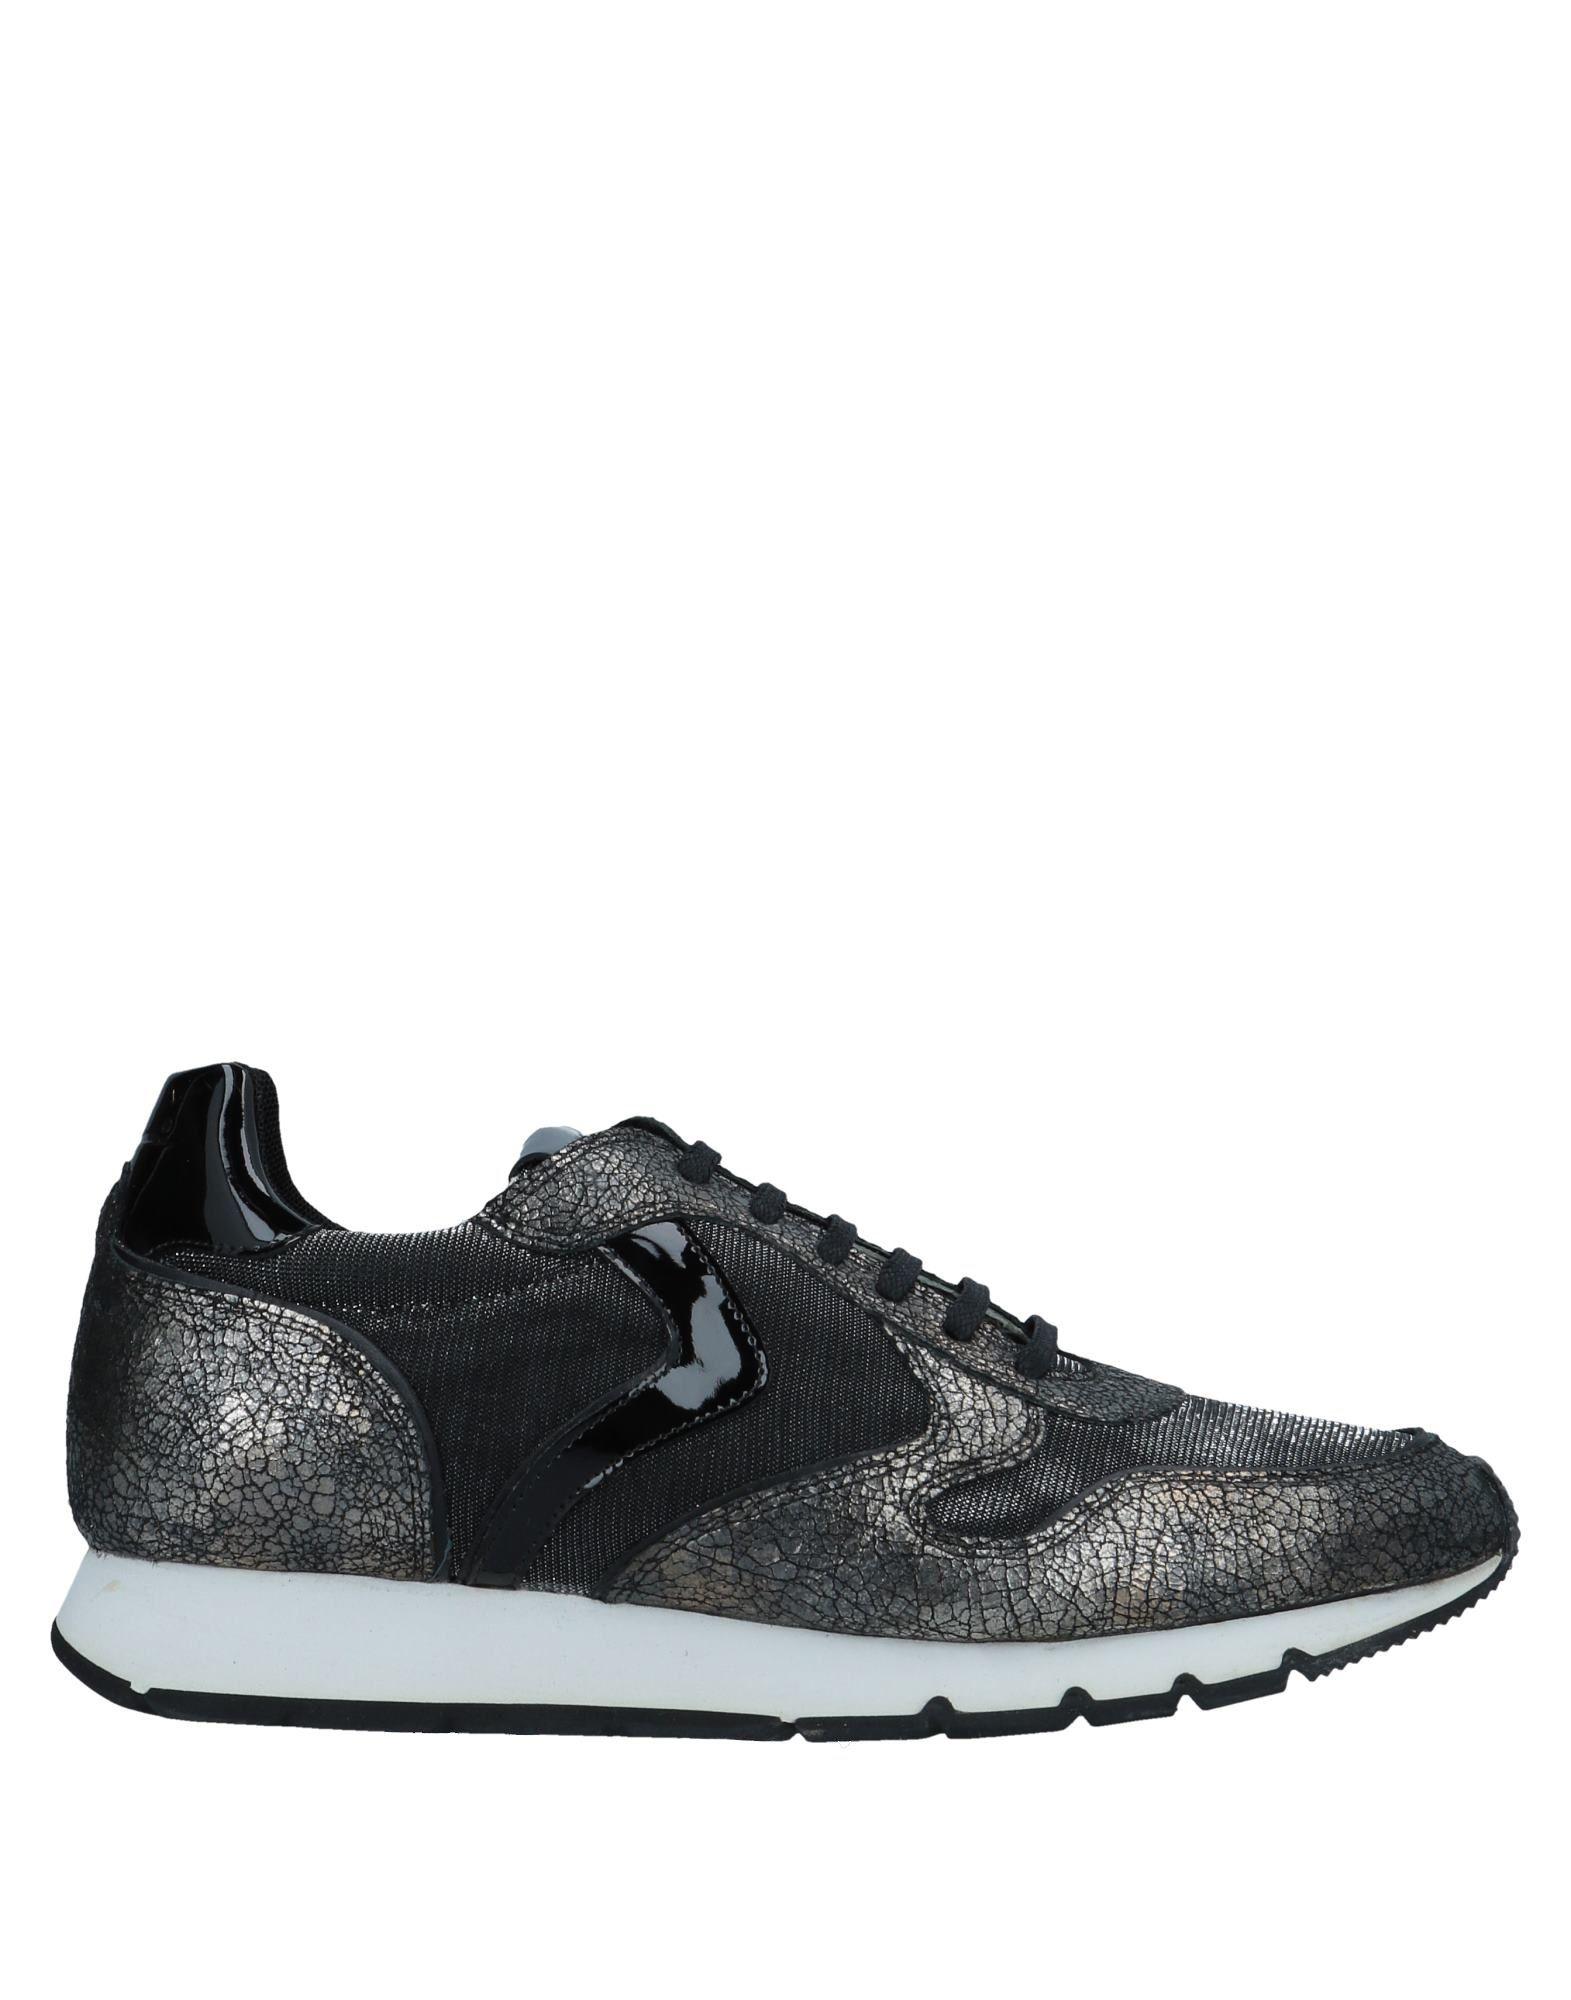 Stilvolle Sneakers billige Schuhe Voile Blanche Sneakers Stilvolle Damen  11580863EP 0d0b37